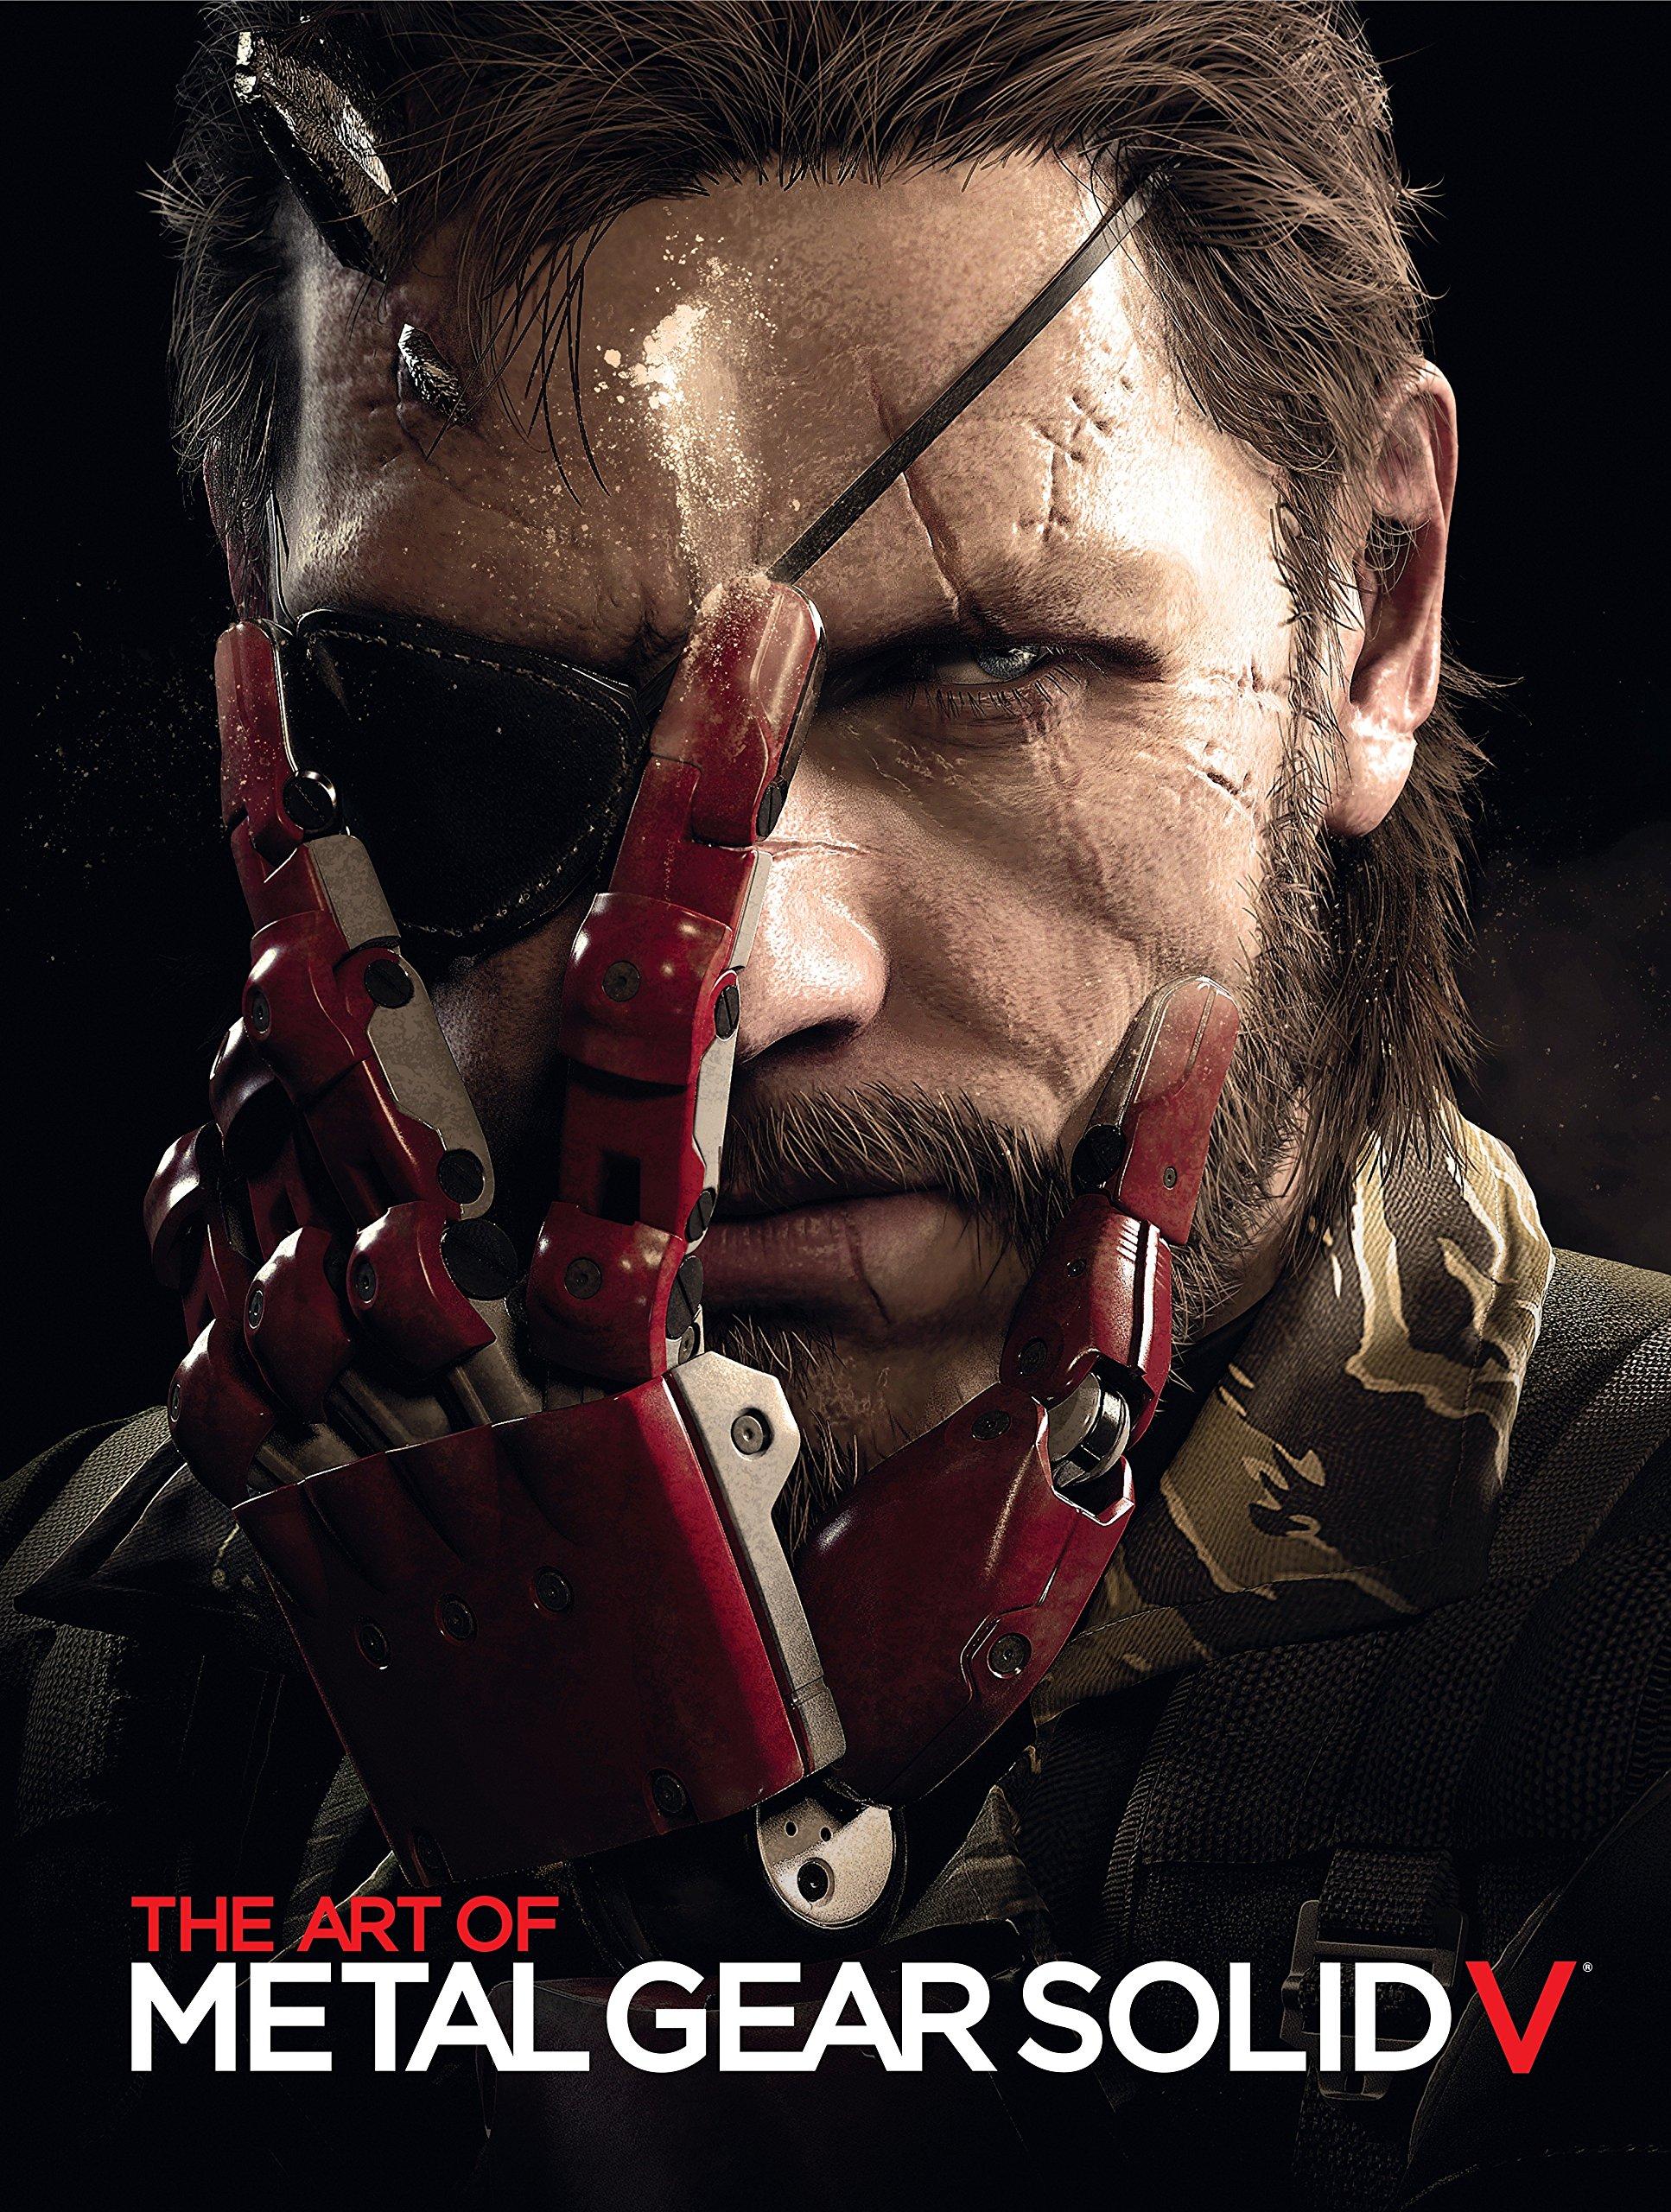 Amazon.com: The Art of Metal Gear Solid V (9781506701103 ...